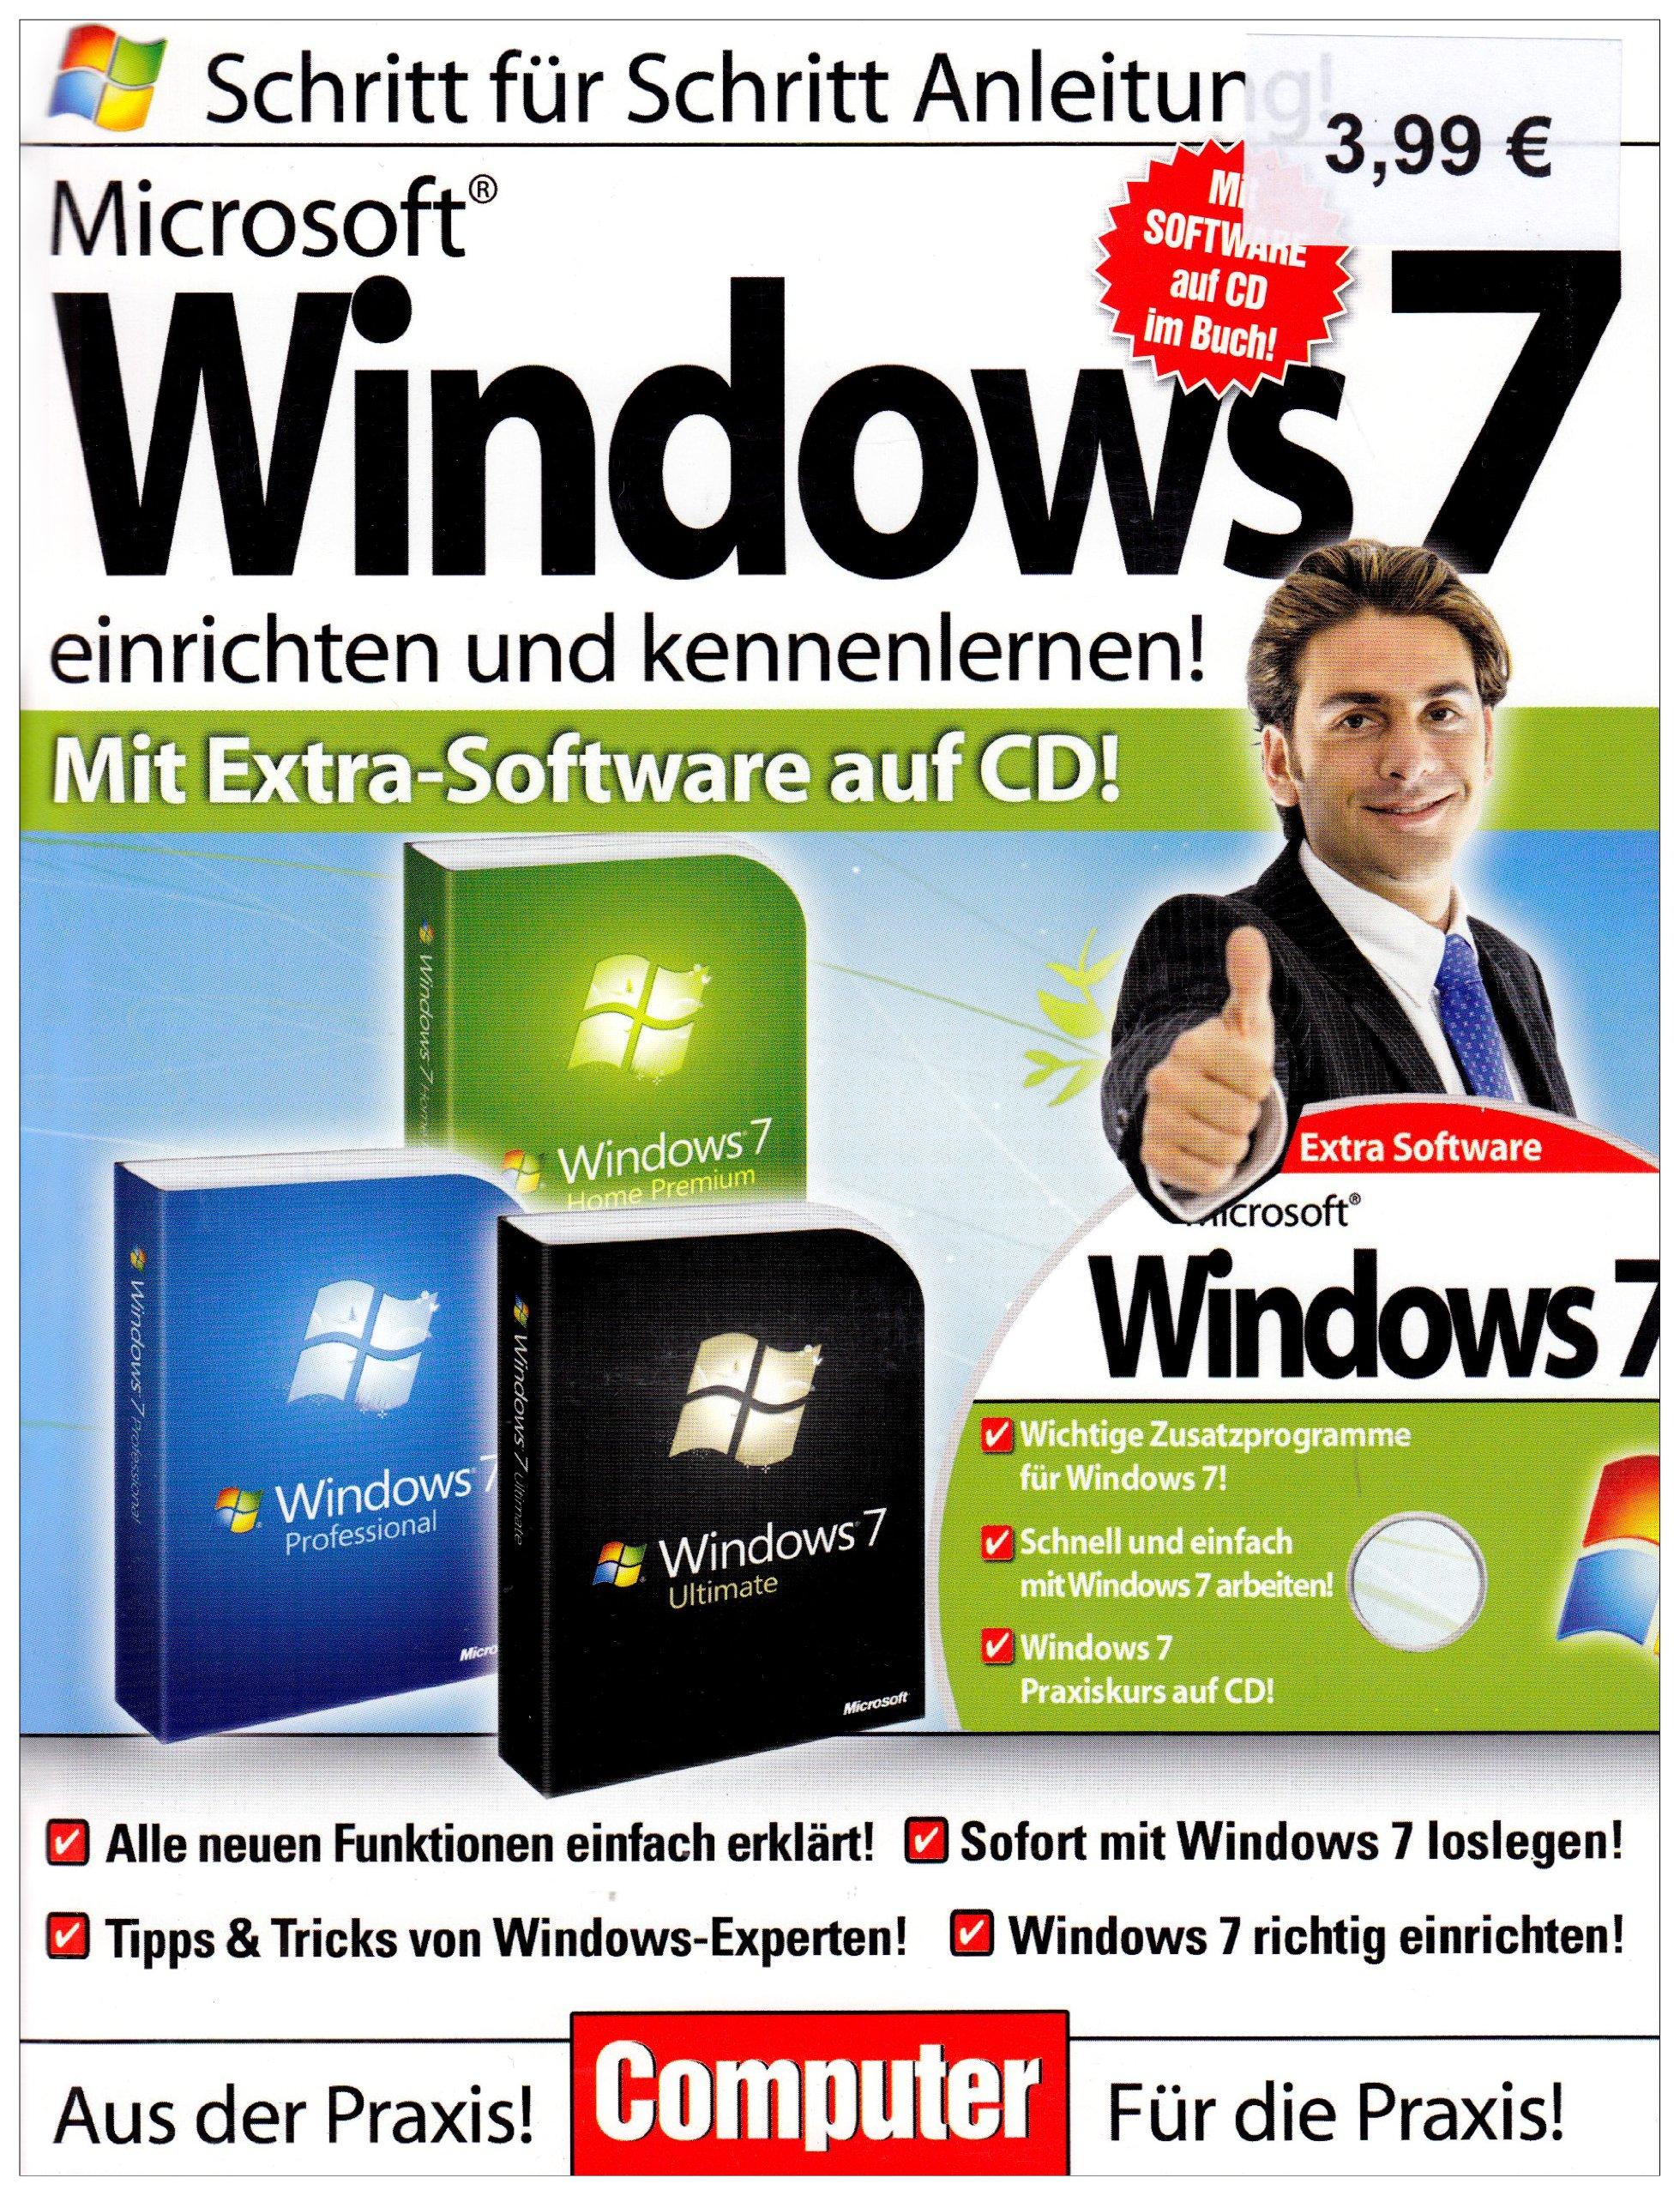 Computerbuch - Windows 7 Einrichten Broschiert – November 2009 Harald Mayer Media Verlagsgesellschaft B00344WAP2 LA4019393965656